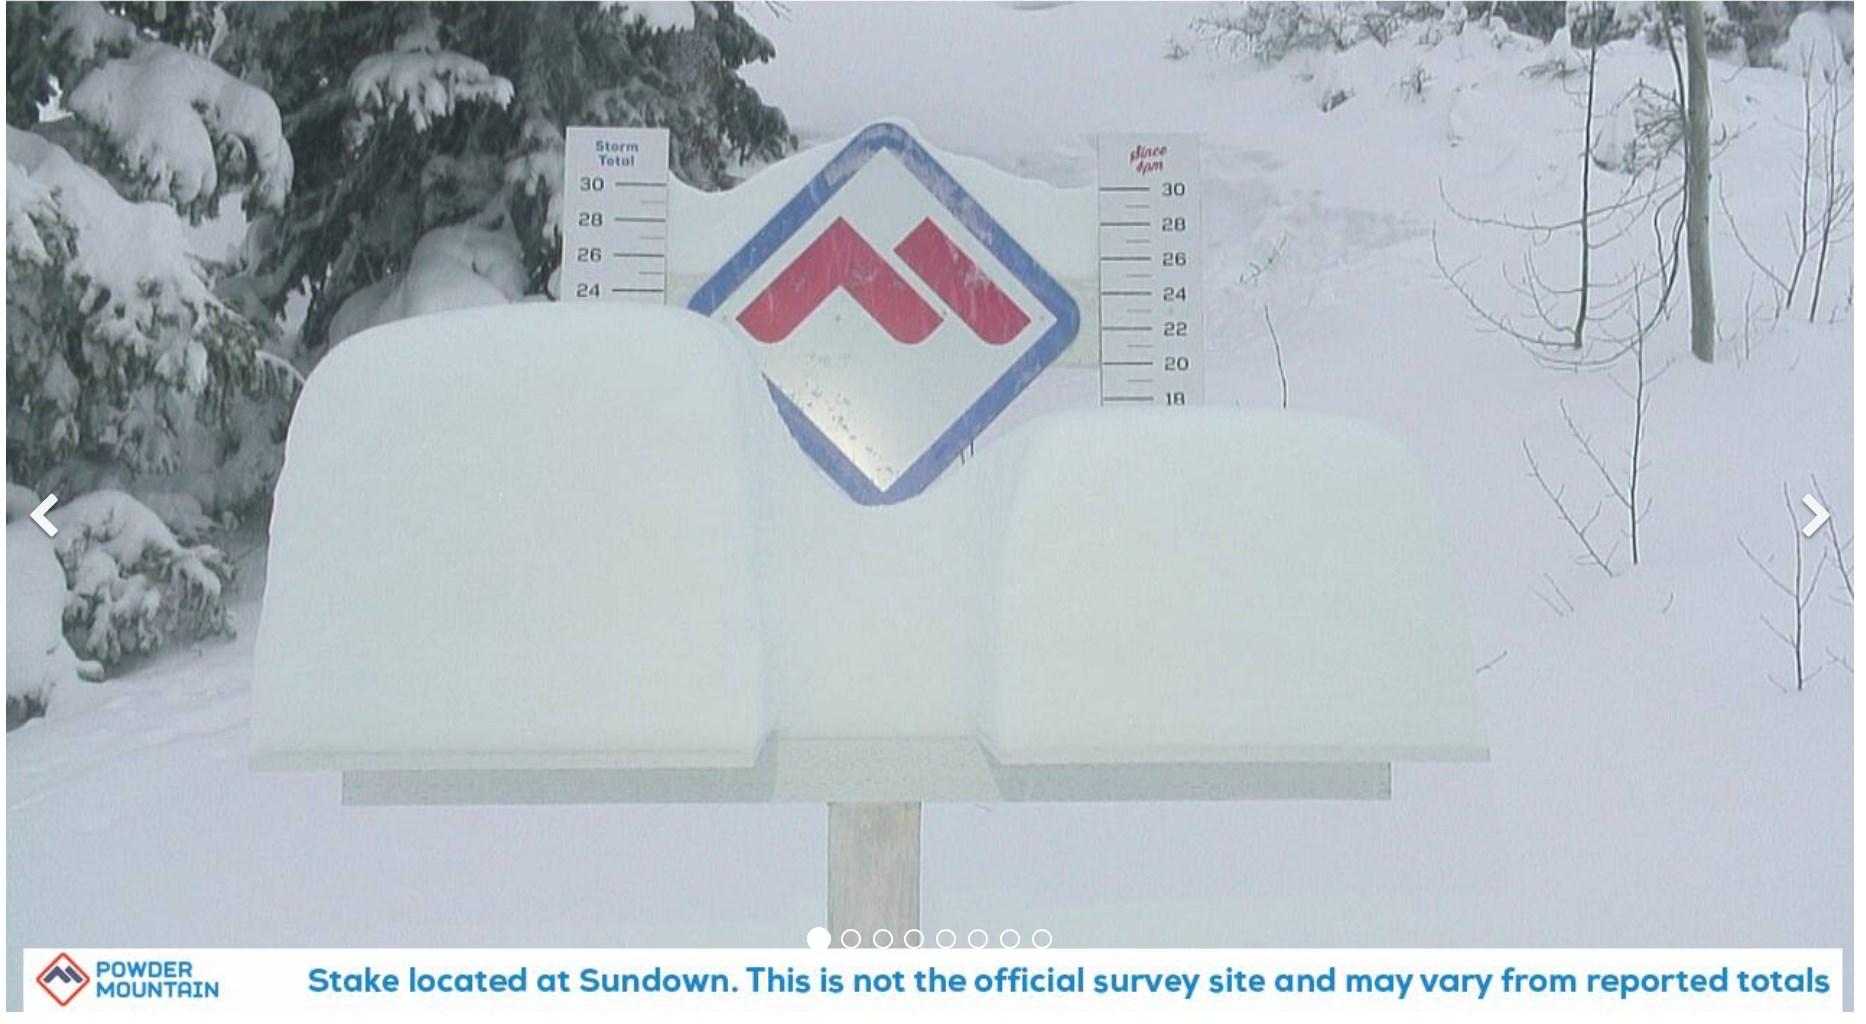 102cm (41 inches) of snowfall this week, Powder Mountain